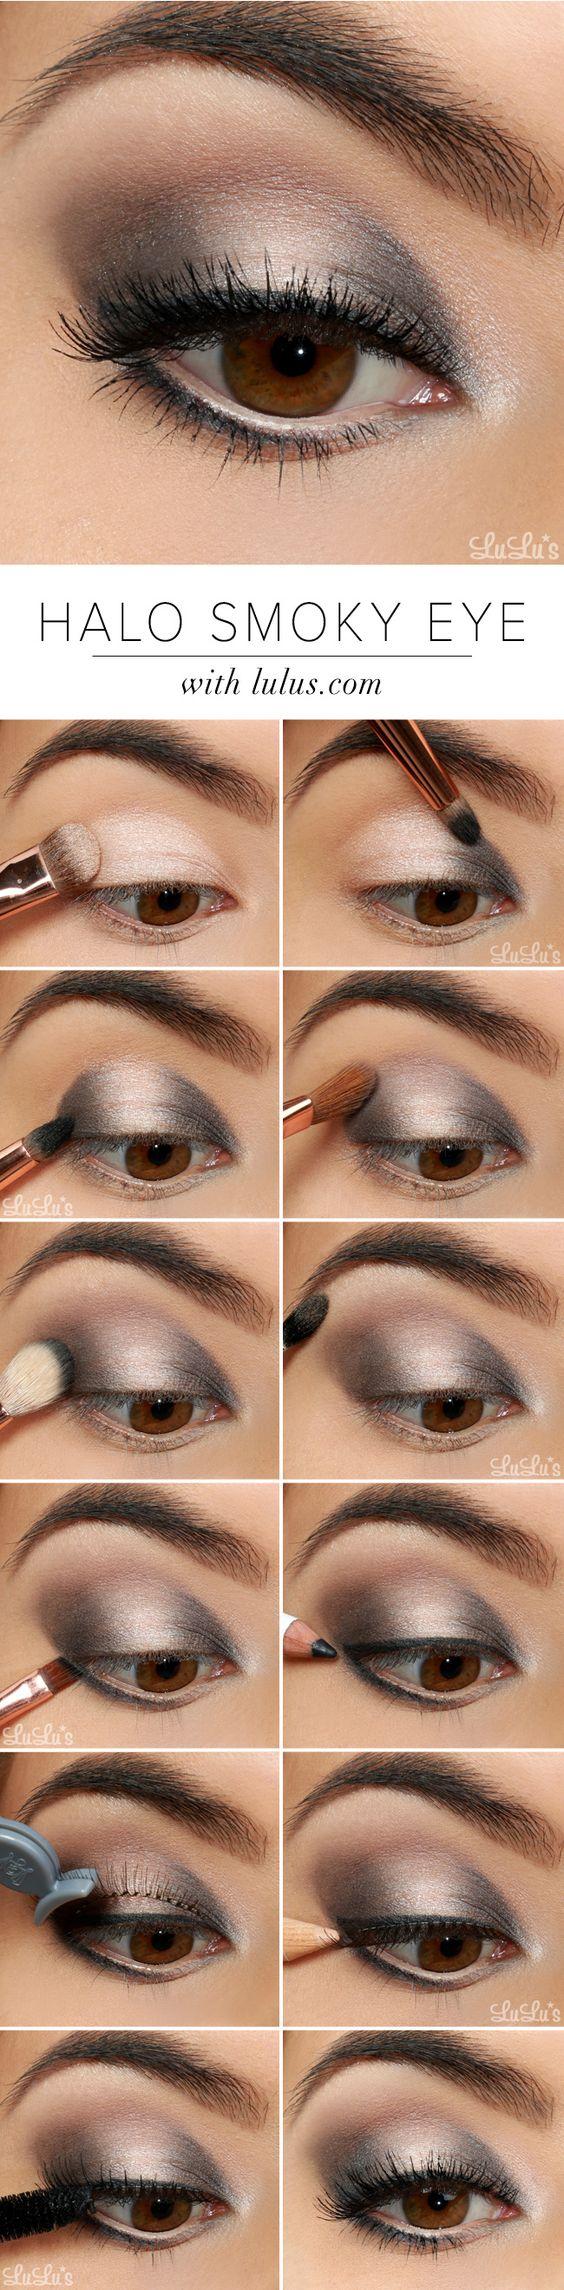 32 easy step by step eyeshadow tutorials for beginners